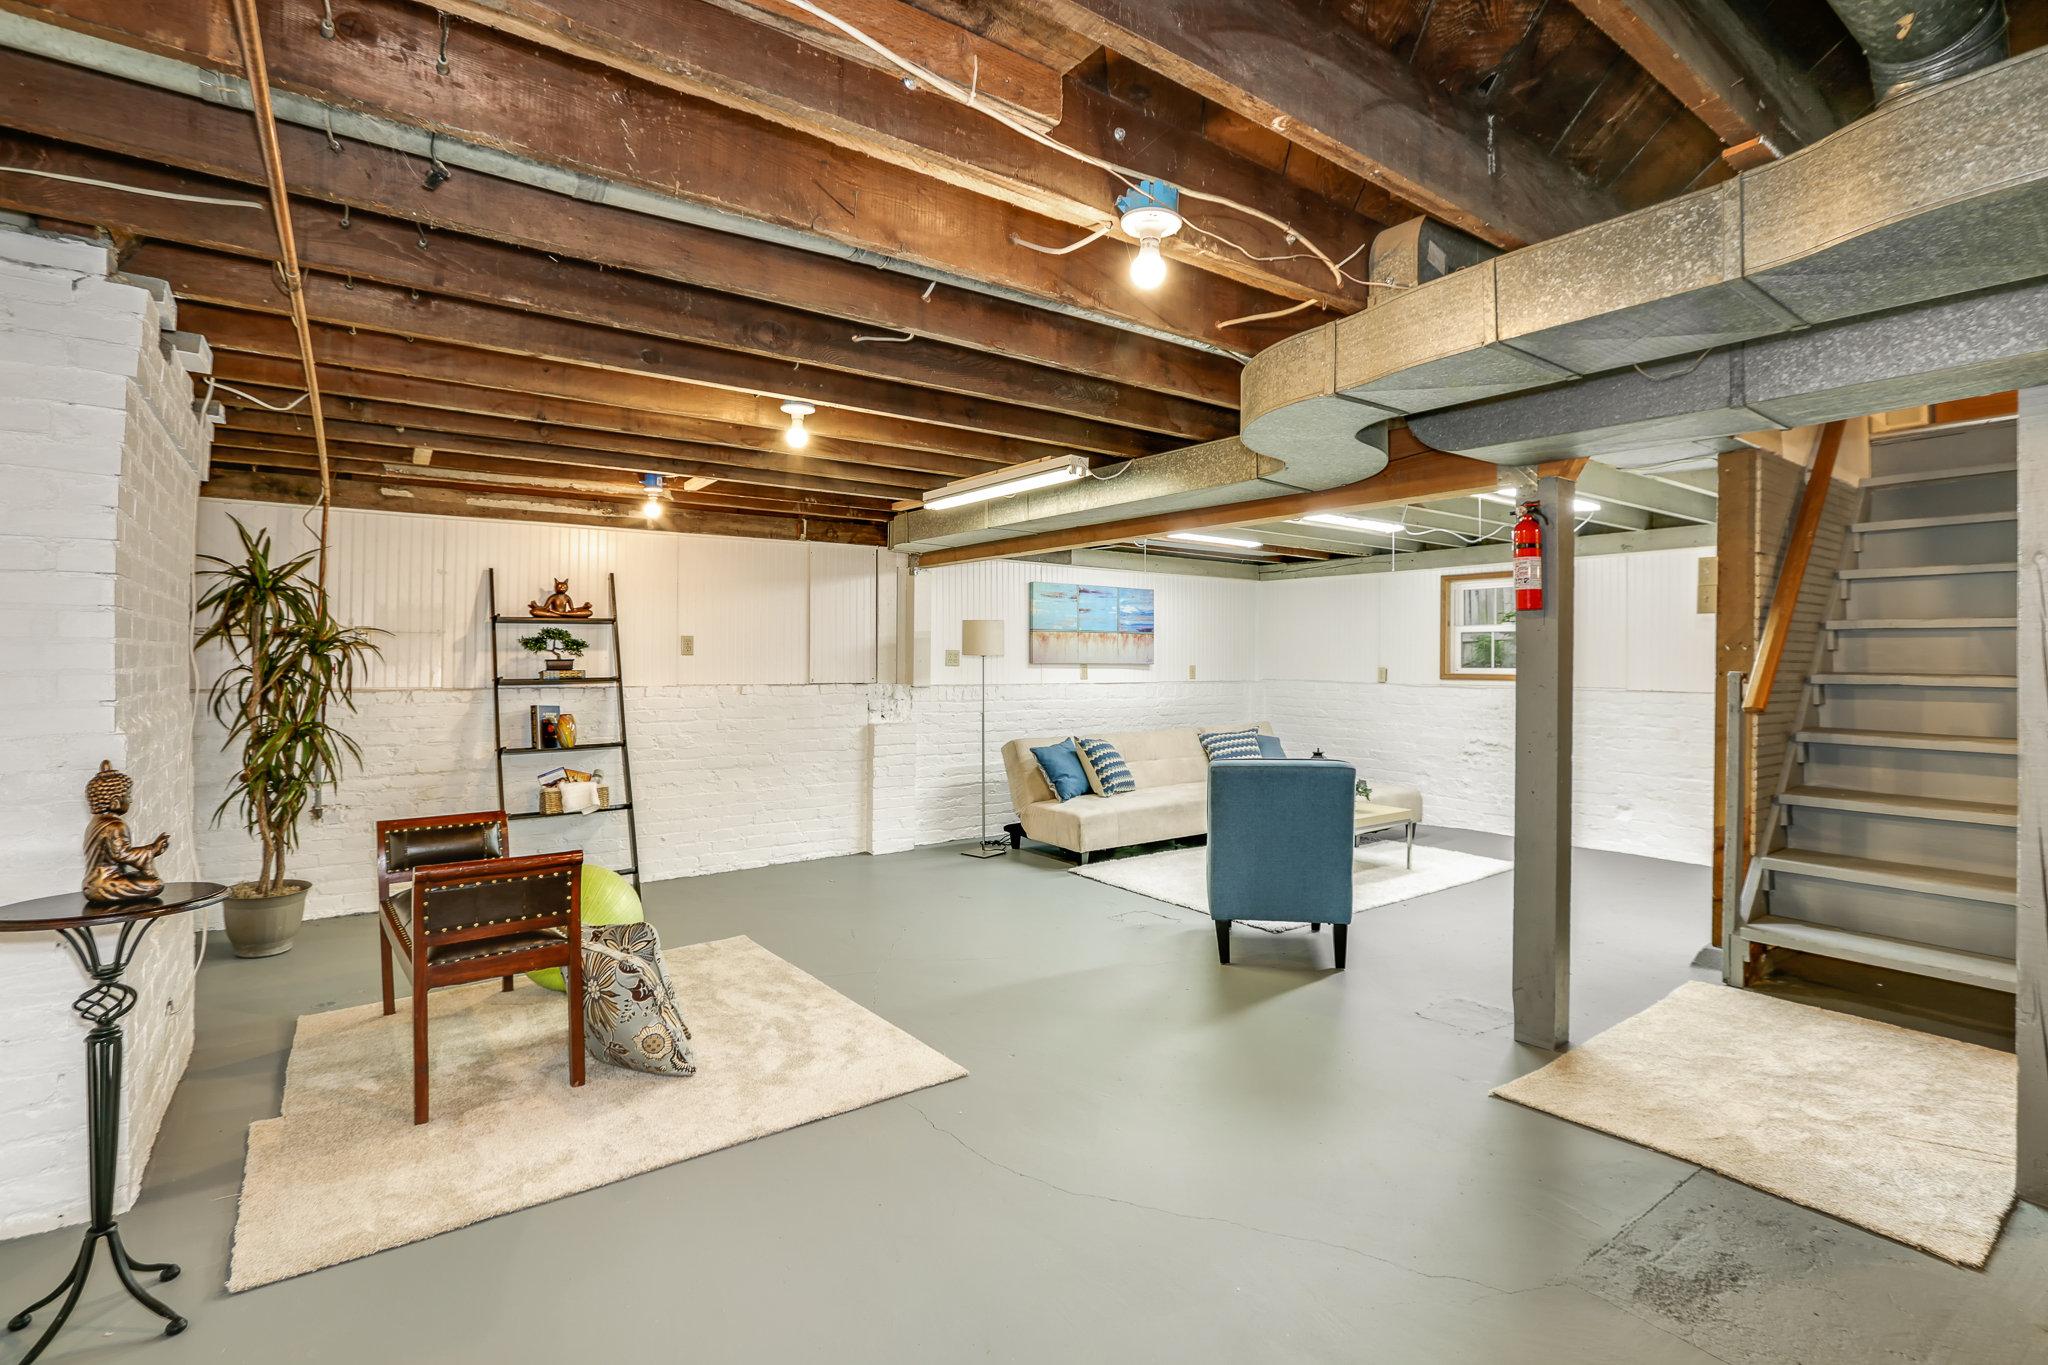 19.7.3 {Heather Rogers} 12354 35th Ave NE, Seattle - EDITED-0022 basement.jpg